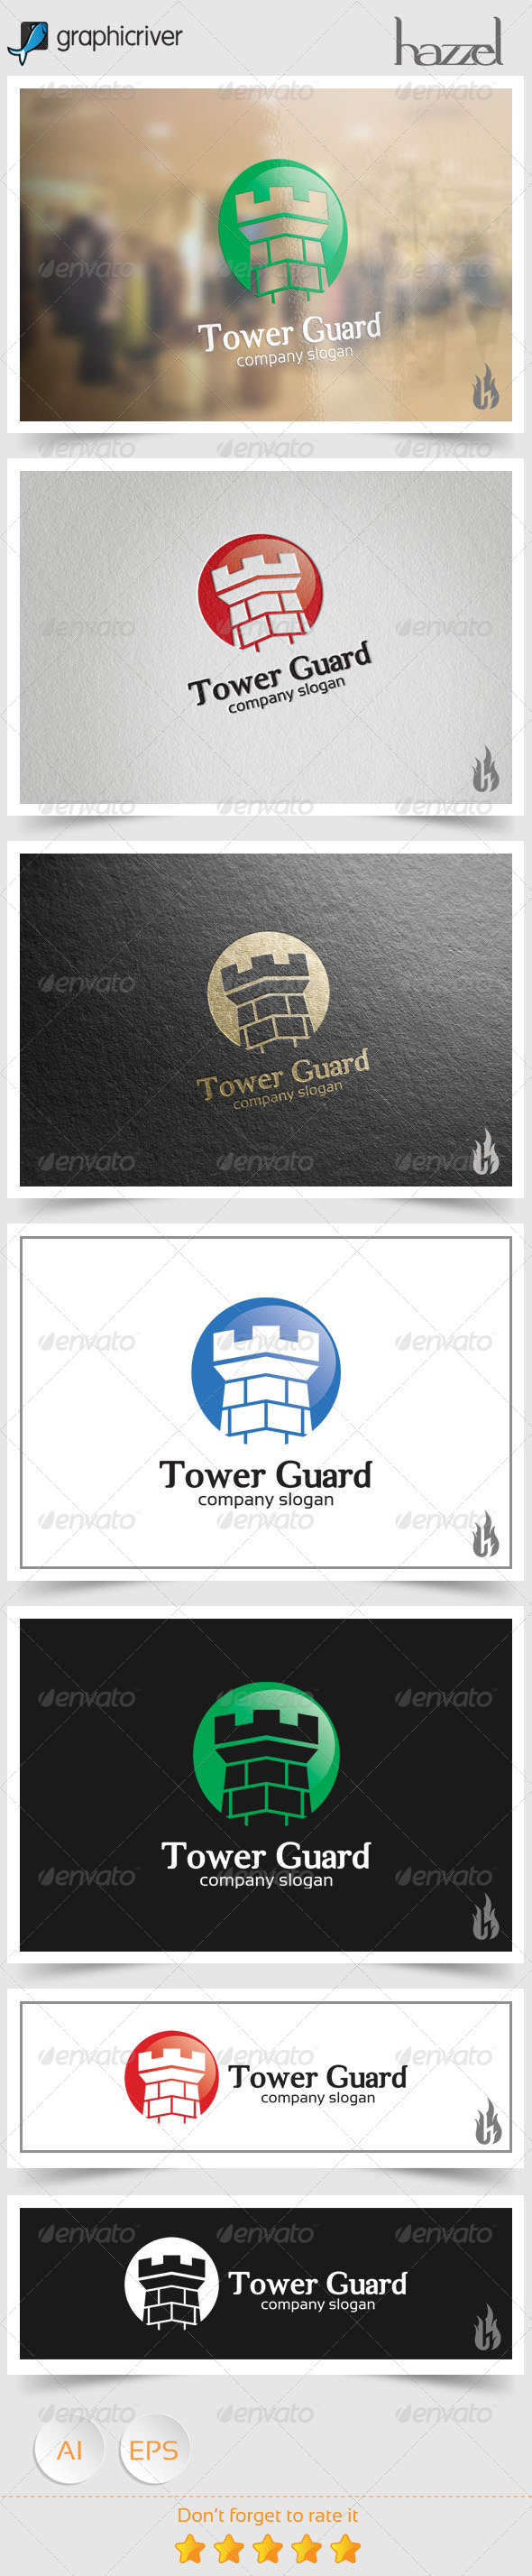 GraphicRiver Tower Guard Logo 8538638